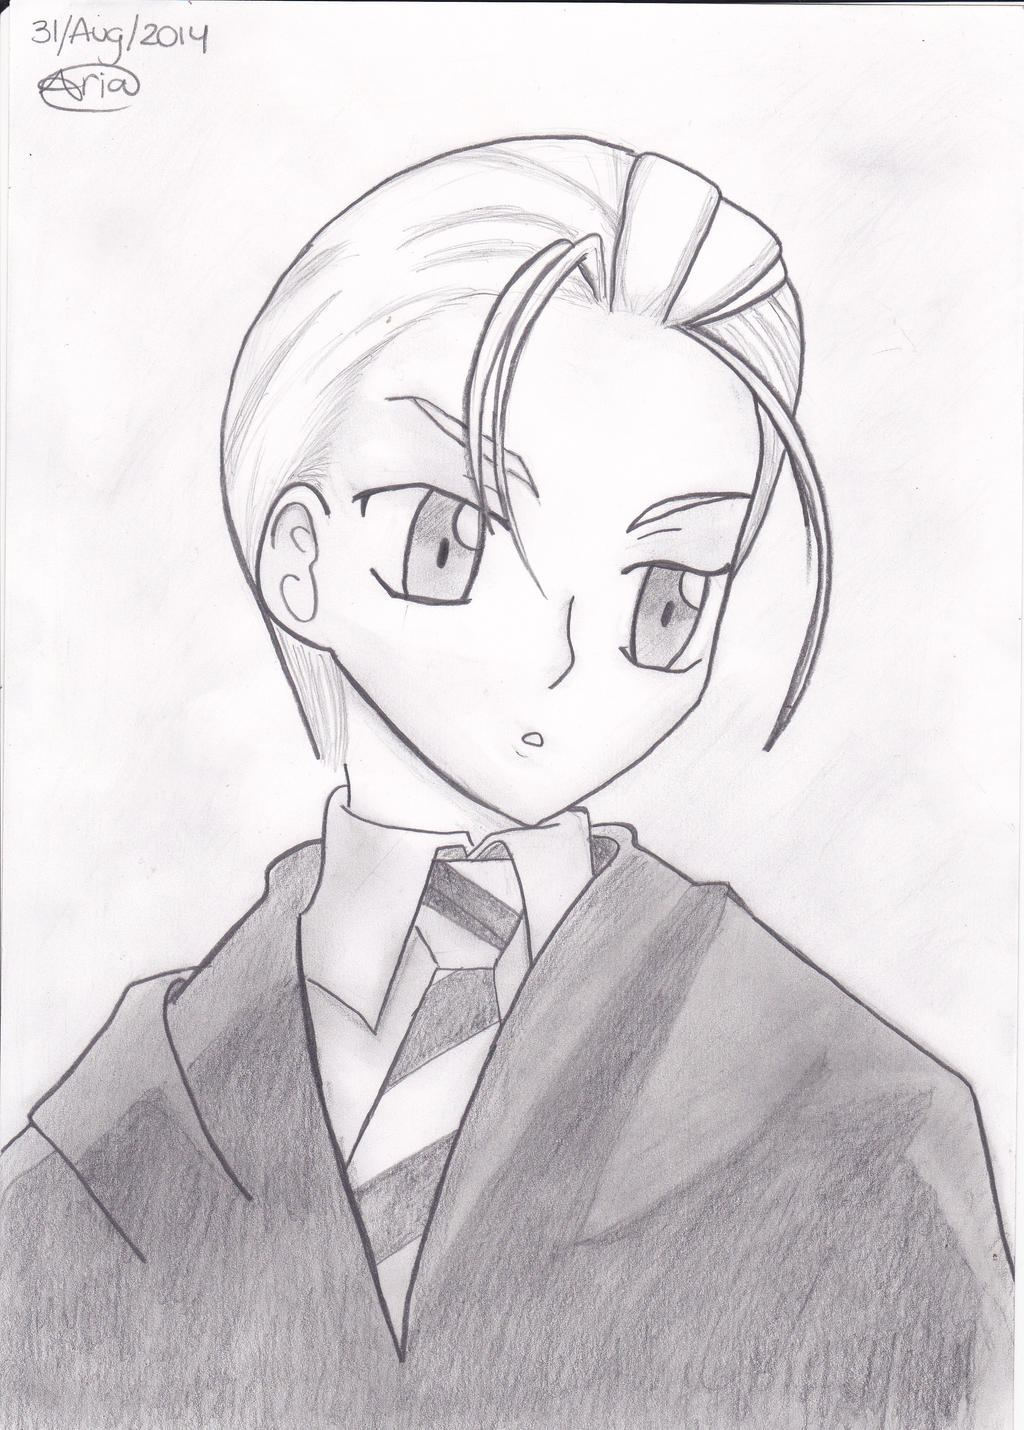 Draco Malfoy Manga Style by Sailor-Aria on DeviantArt